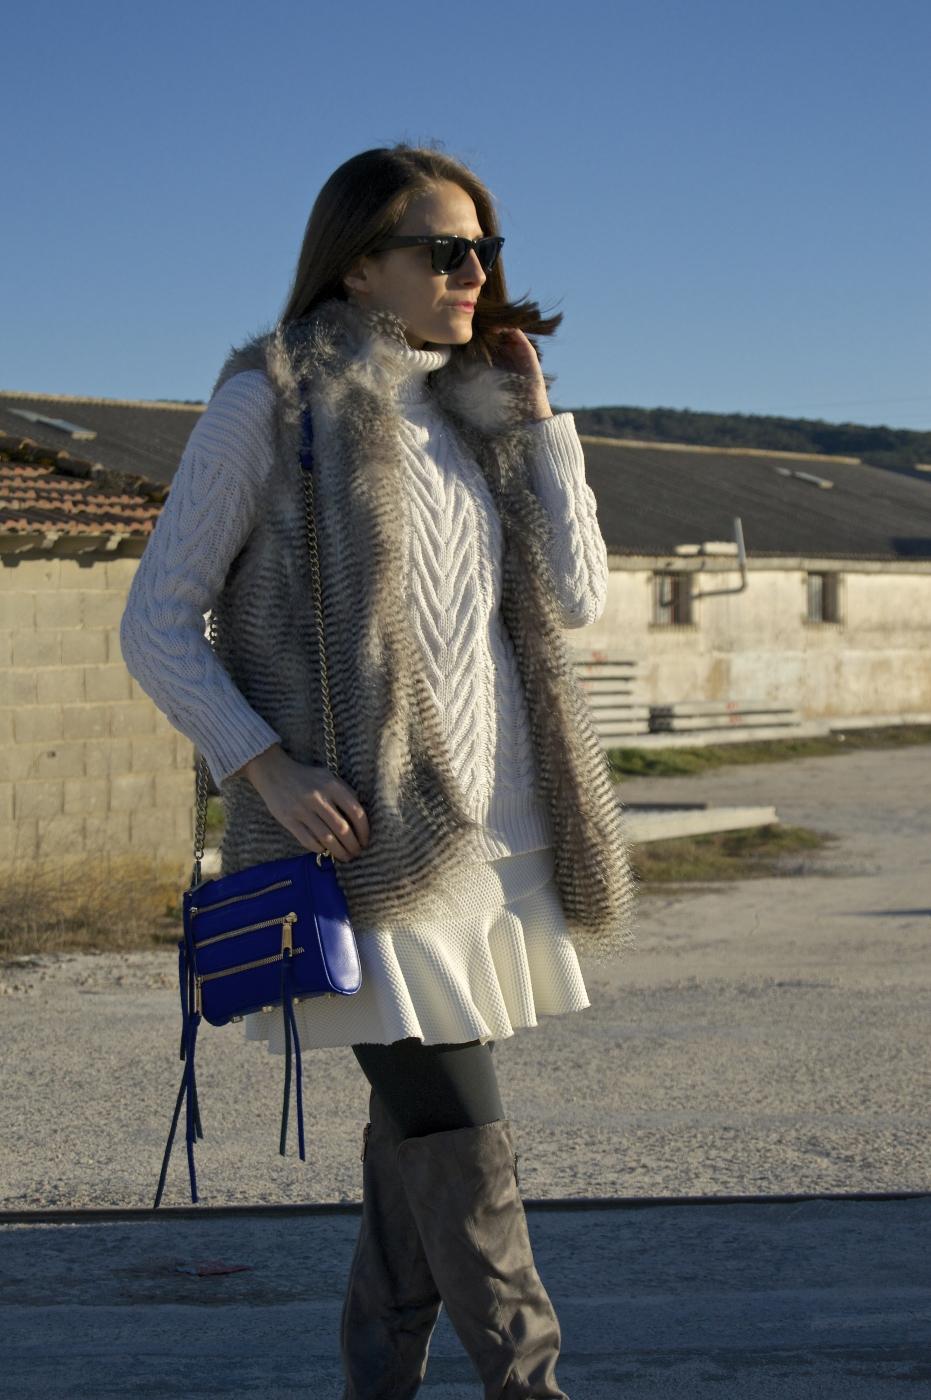 lara-vazquez-mad-lula-style-pop-of-blue-ootd-look-fashion